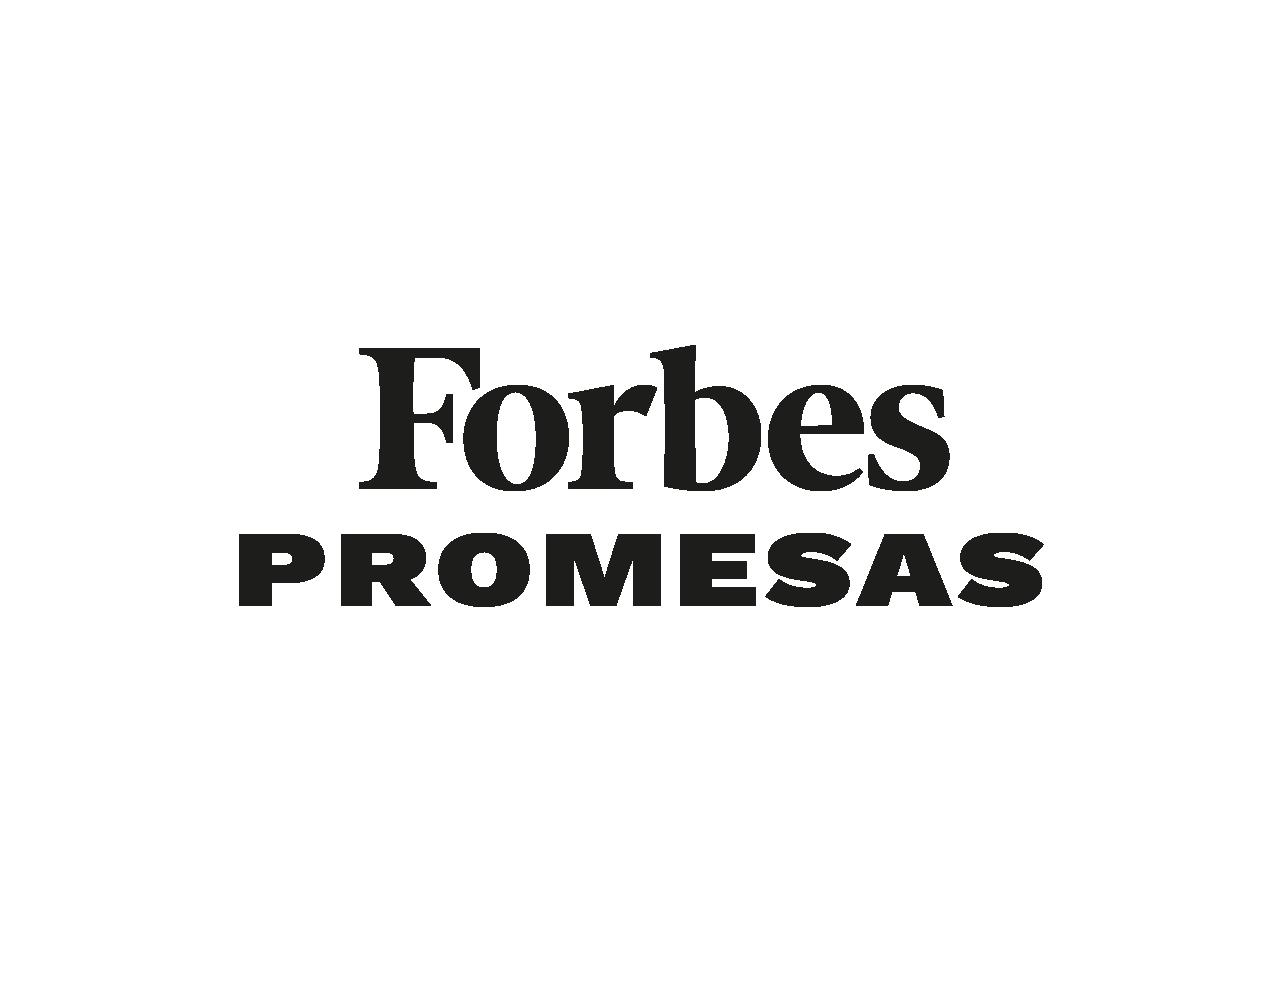 Promesas Forbes